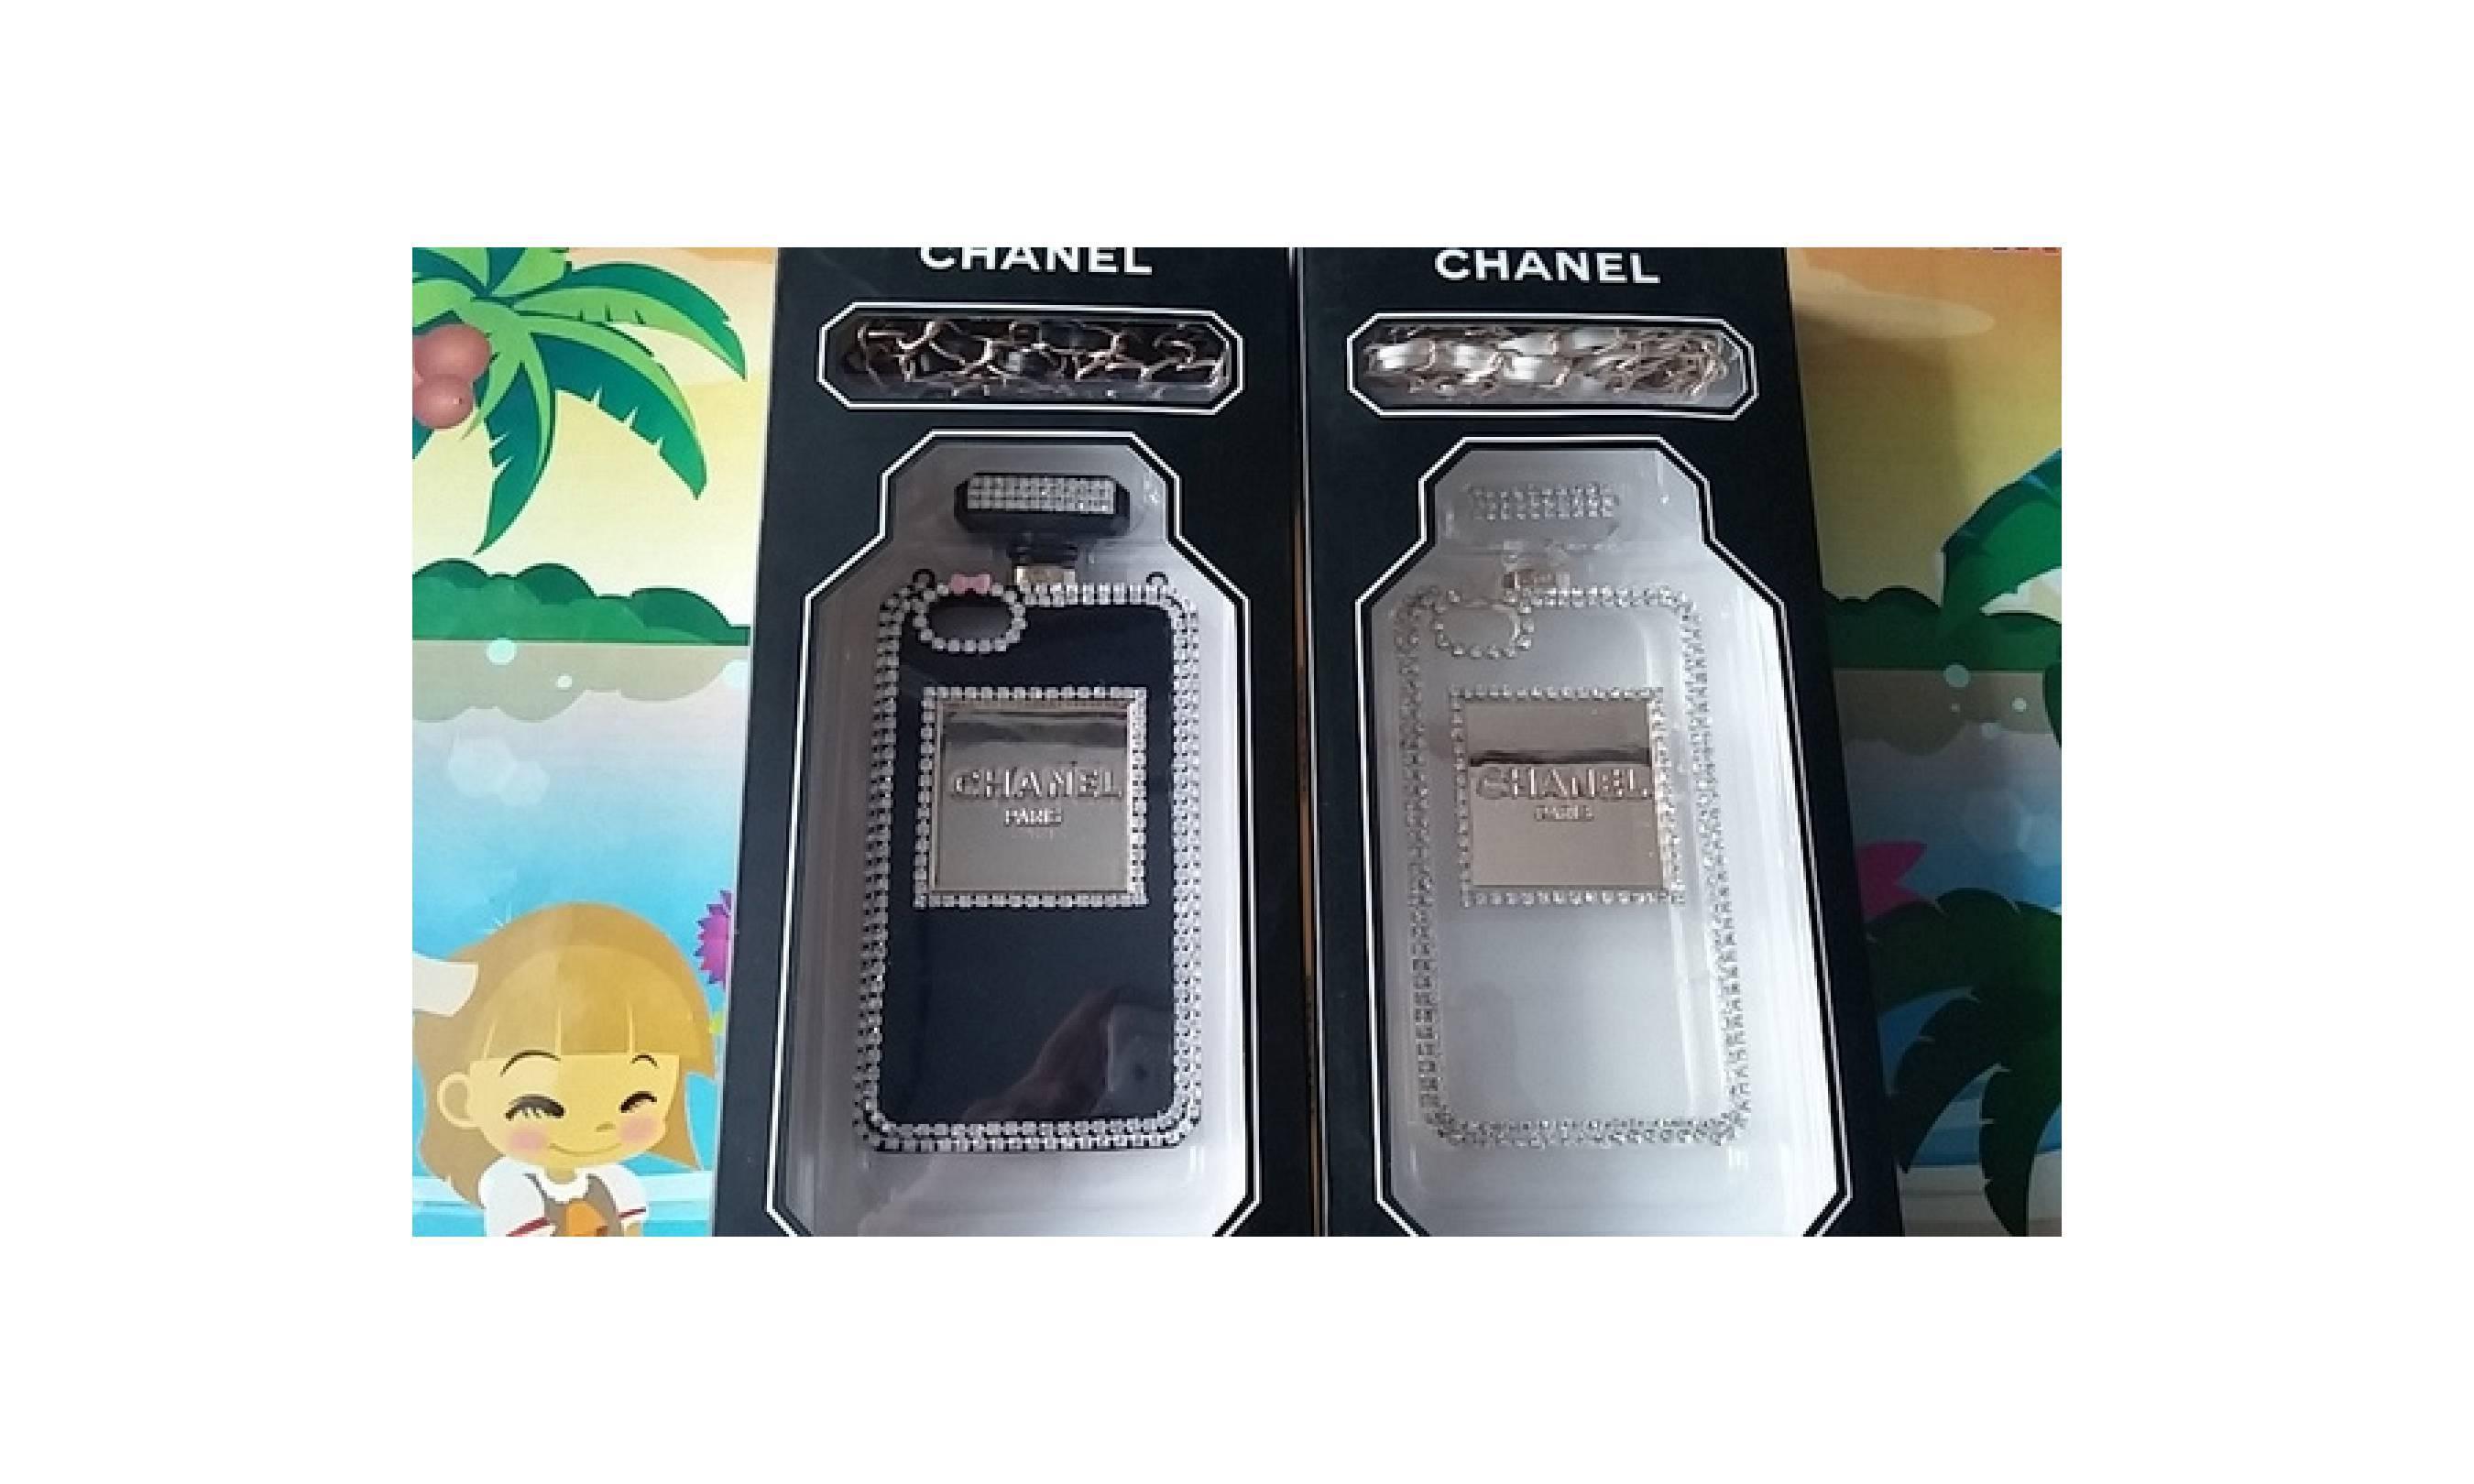 Apple Iphone 5 / 5S Perfume Bottle Paris Case Diamond Exclusive